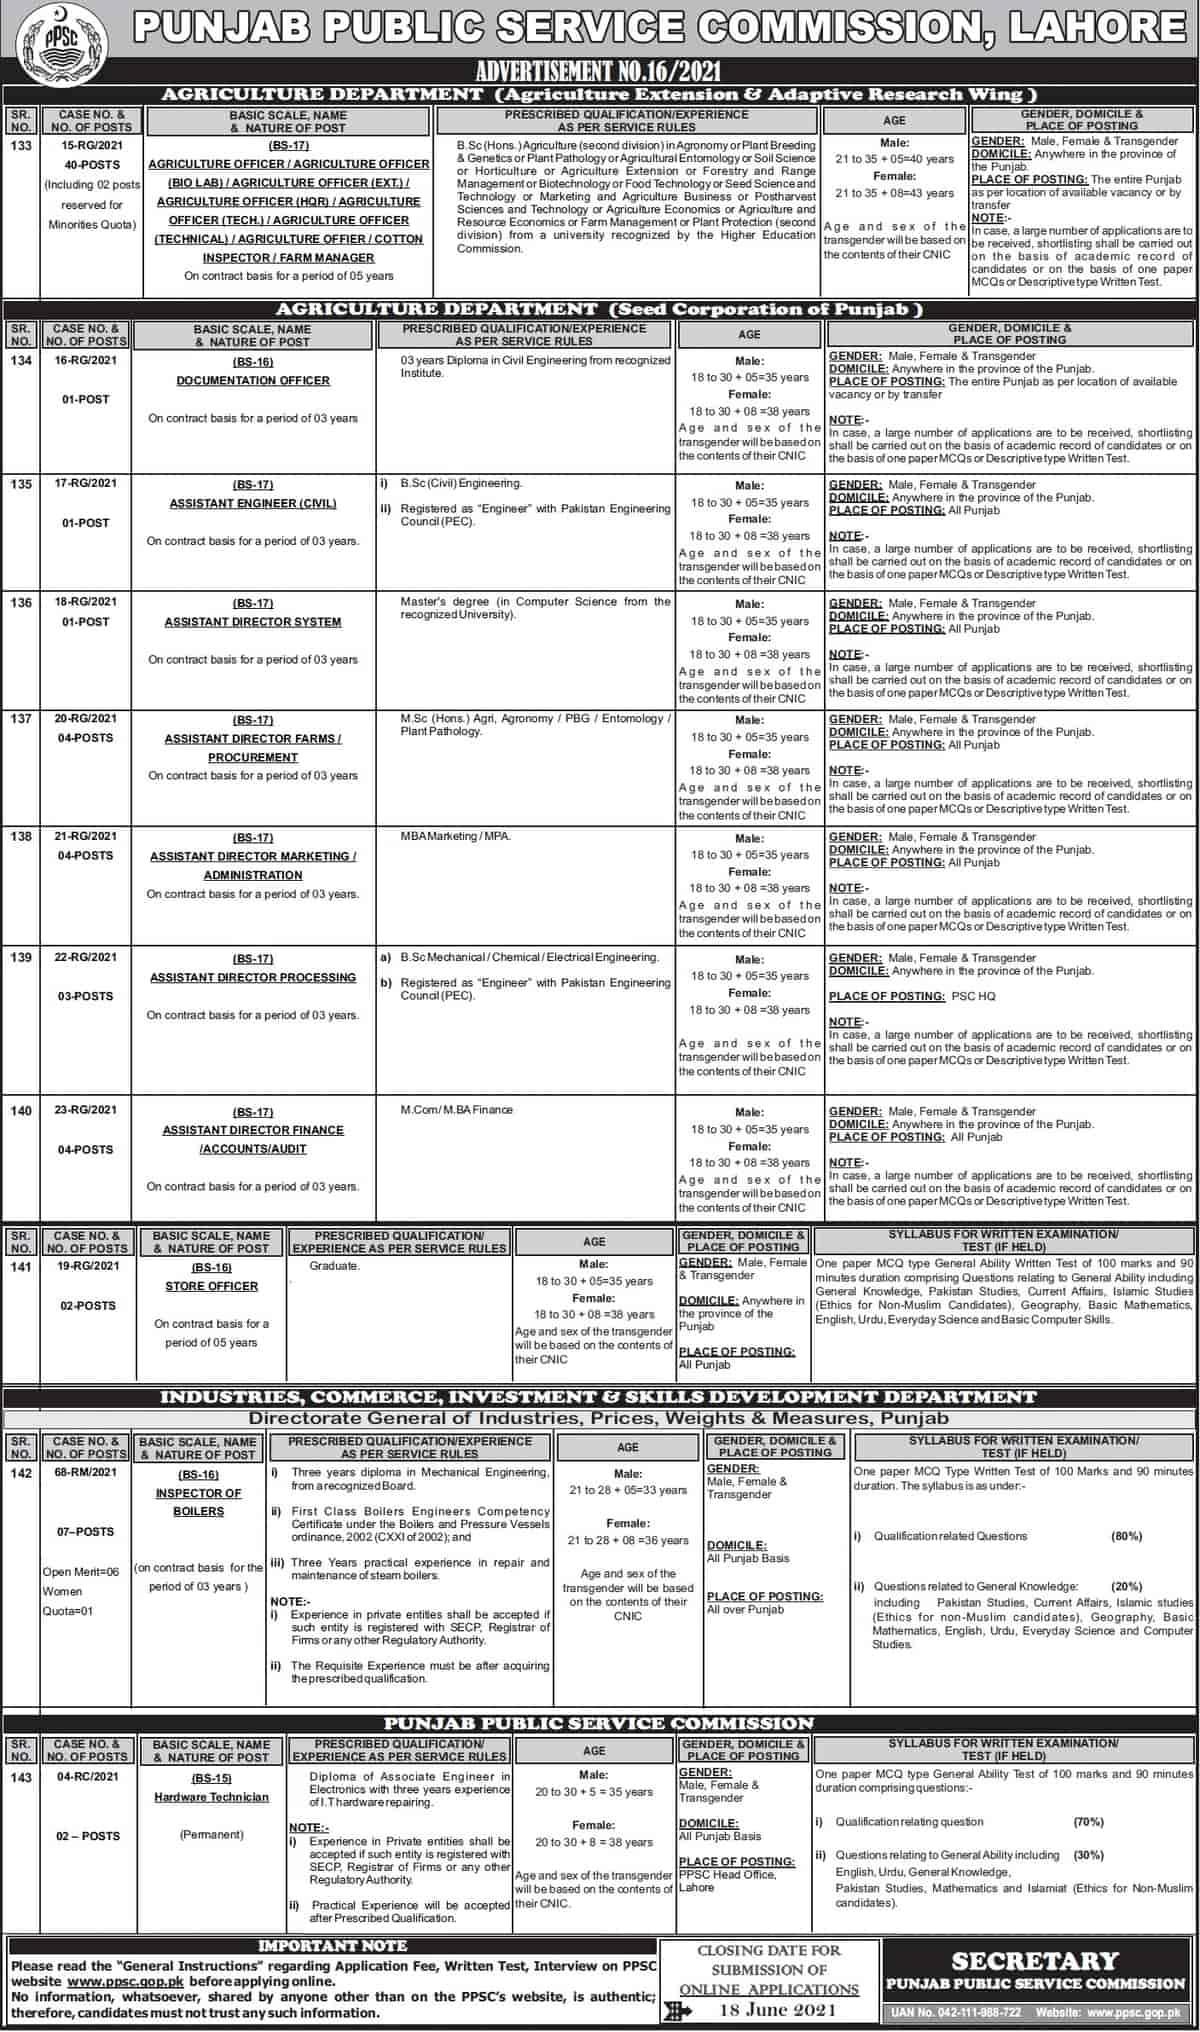 PPSC Jobs Advertisement No 16 2021 Apply Online Latest